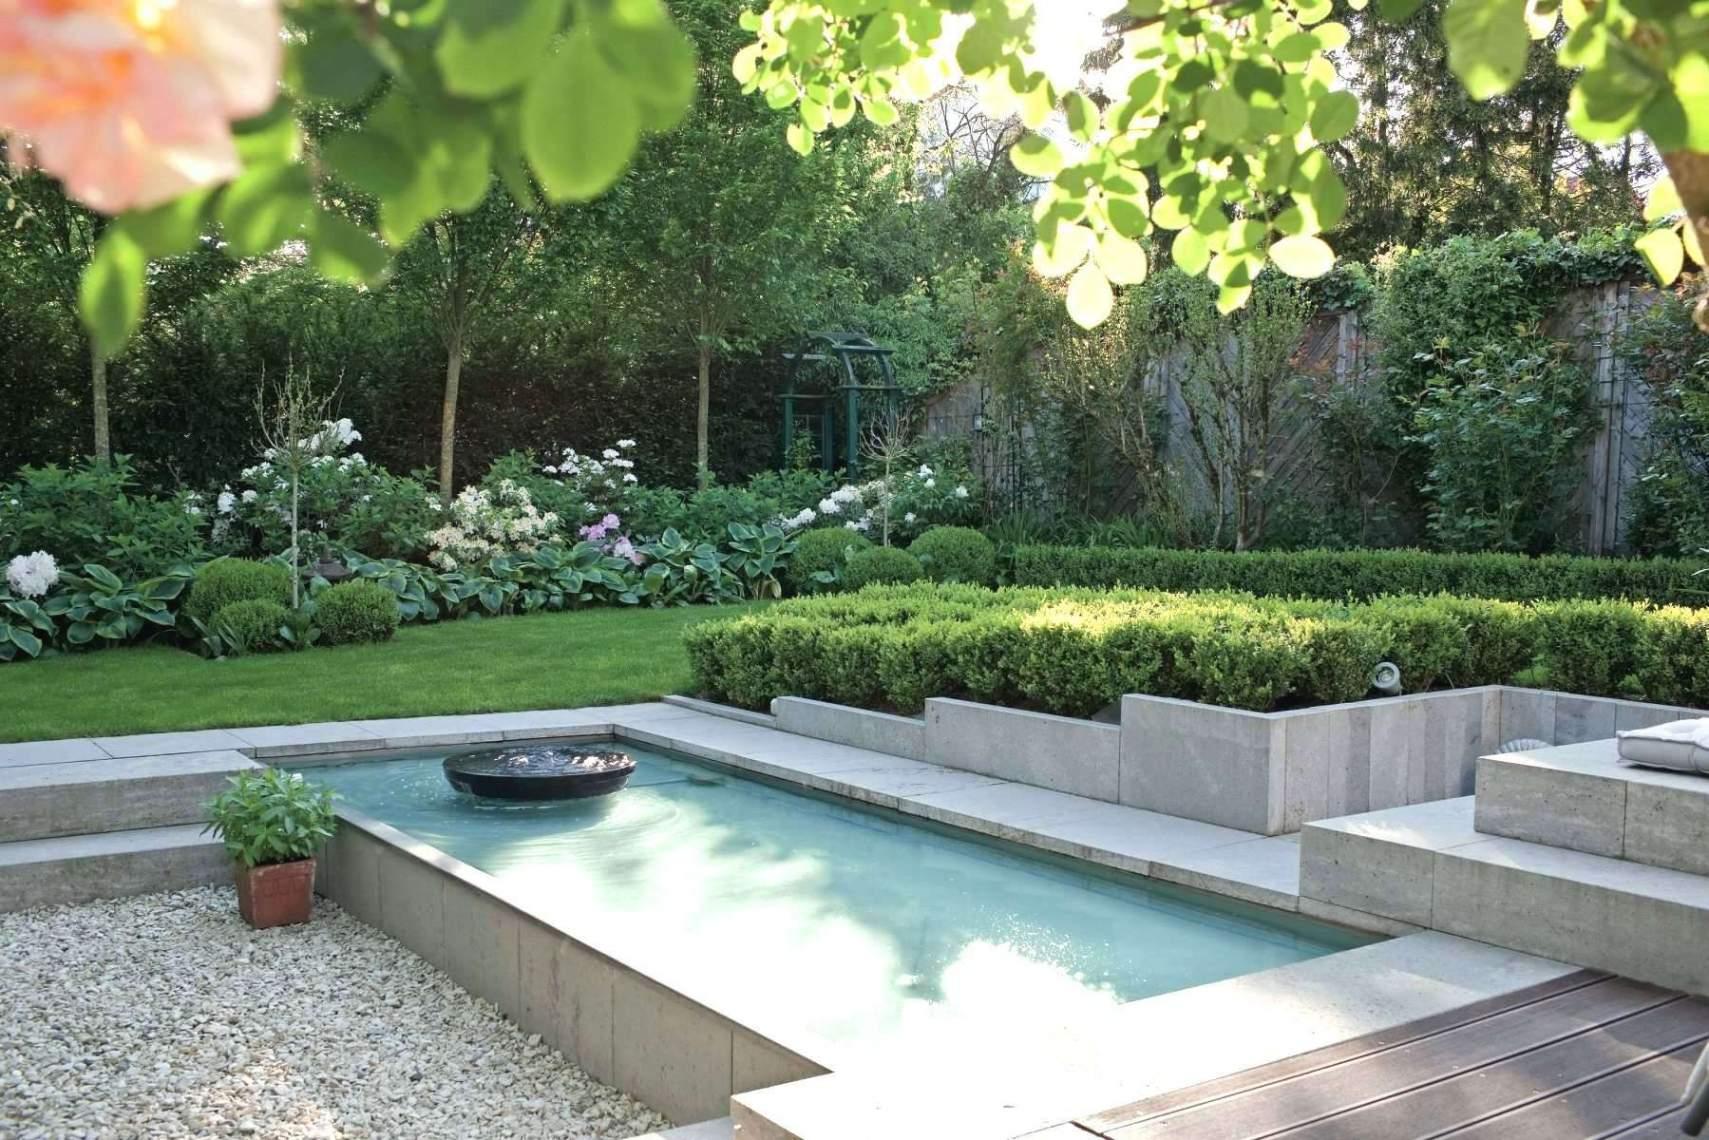 garten anlegen ideen frisch kleiner reihenhausgarten gestalten temobardz home blog of garten anlegen ideen